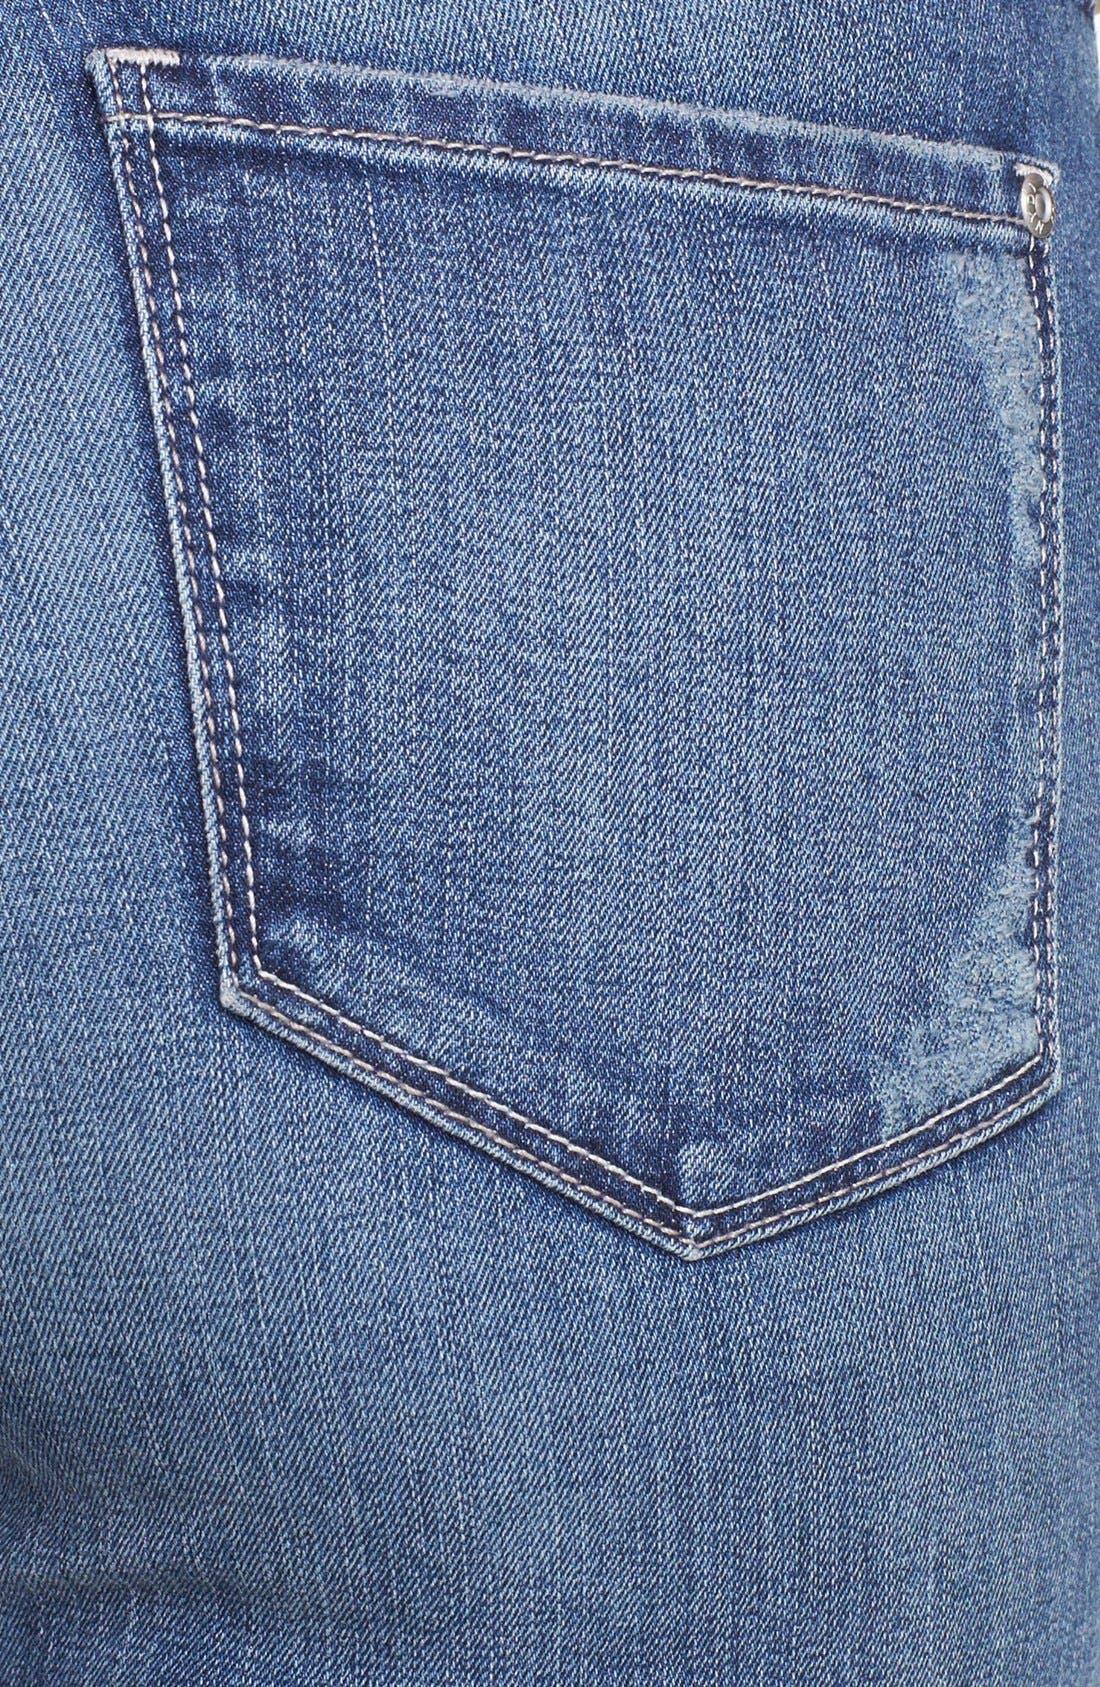 Alternate Image 3  - NYDJ 'Leann' Stretch Skinny Boyfriend Jeans (Lake Arrowhead) (Regular & Petite)